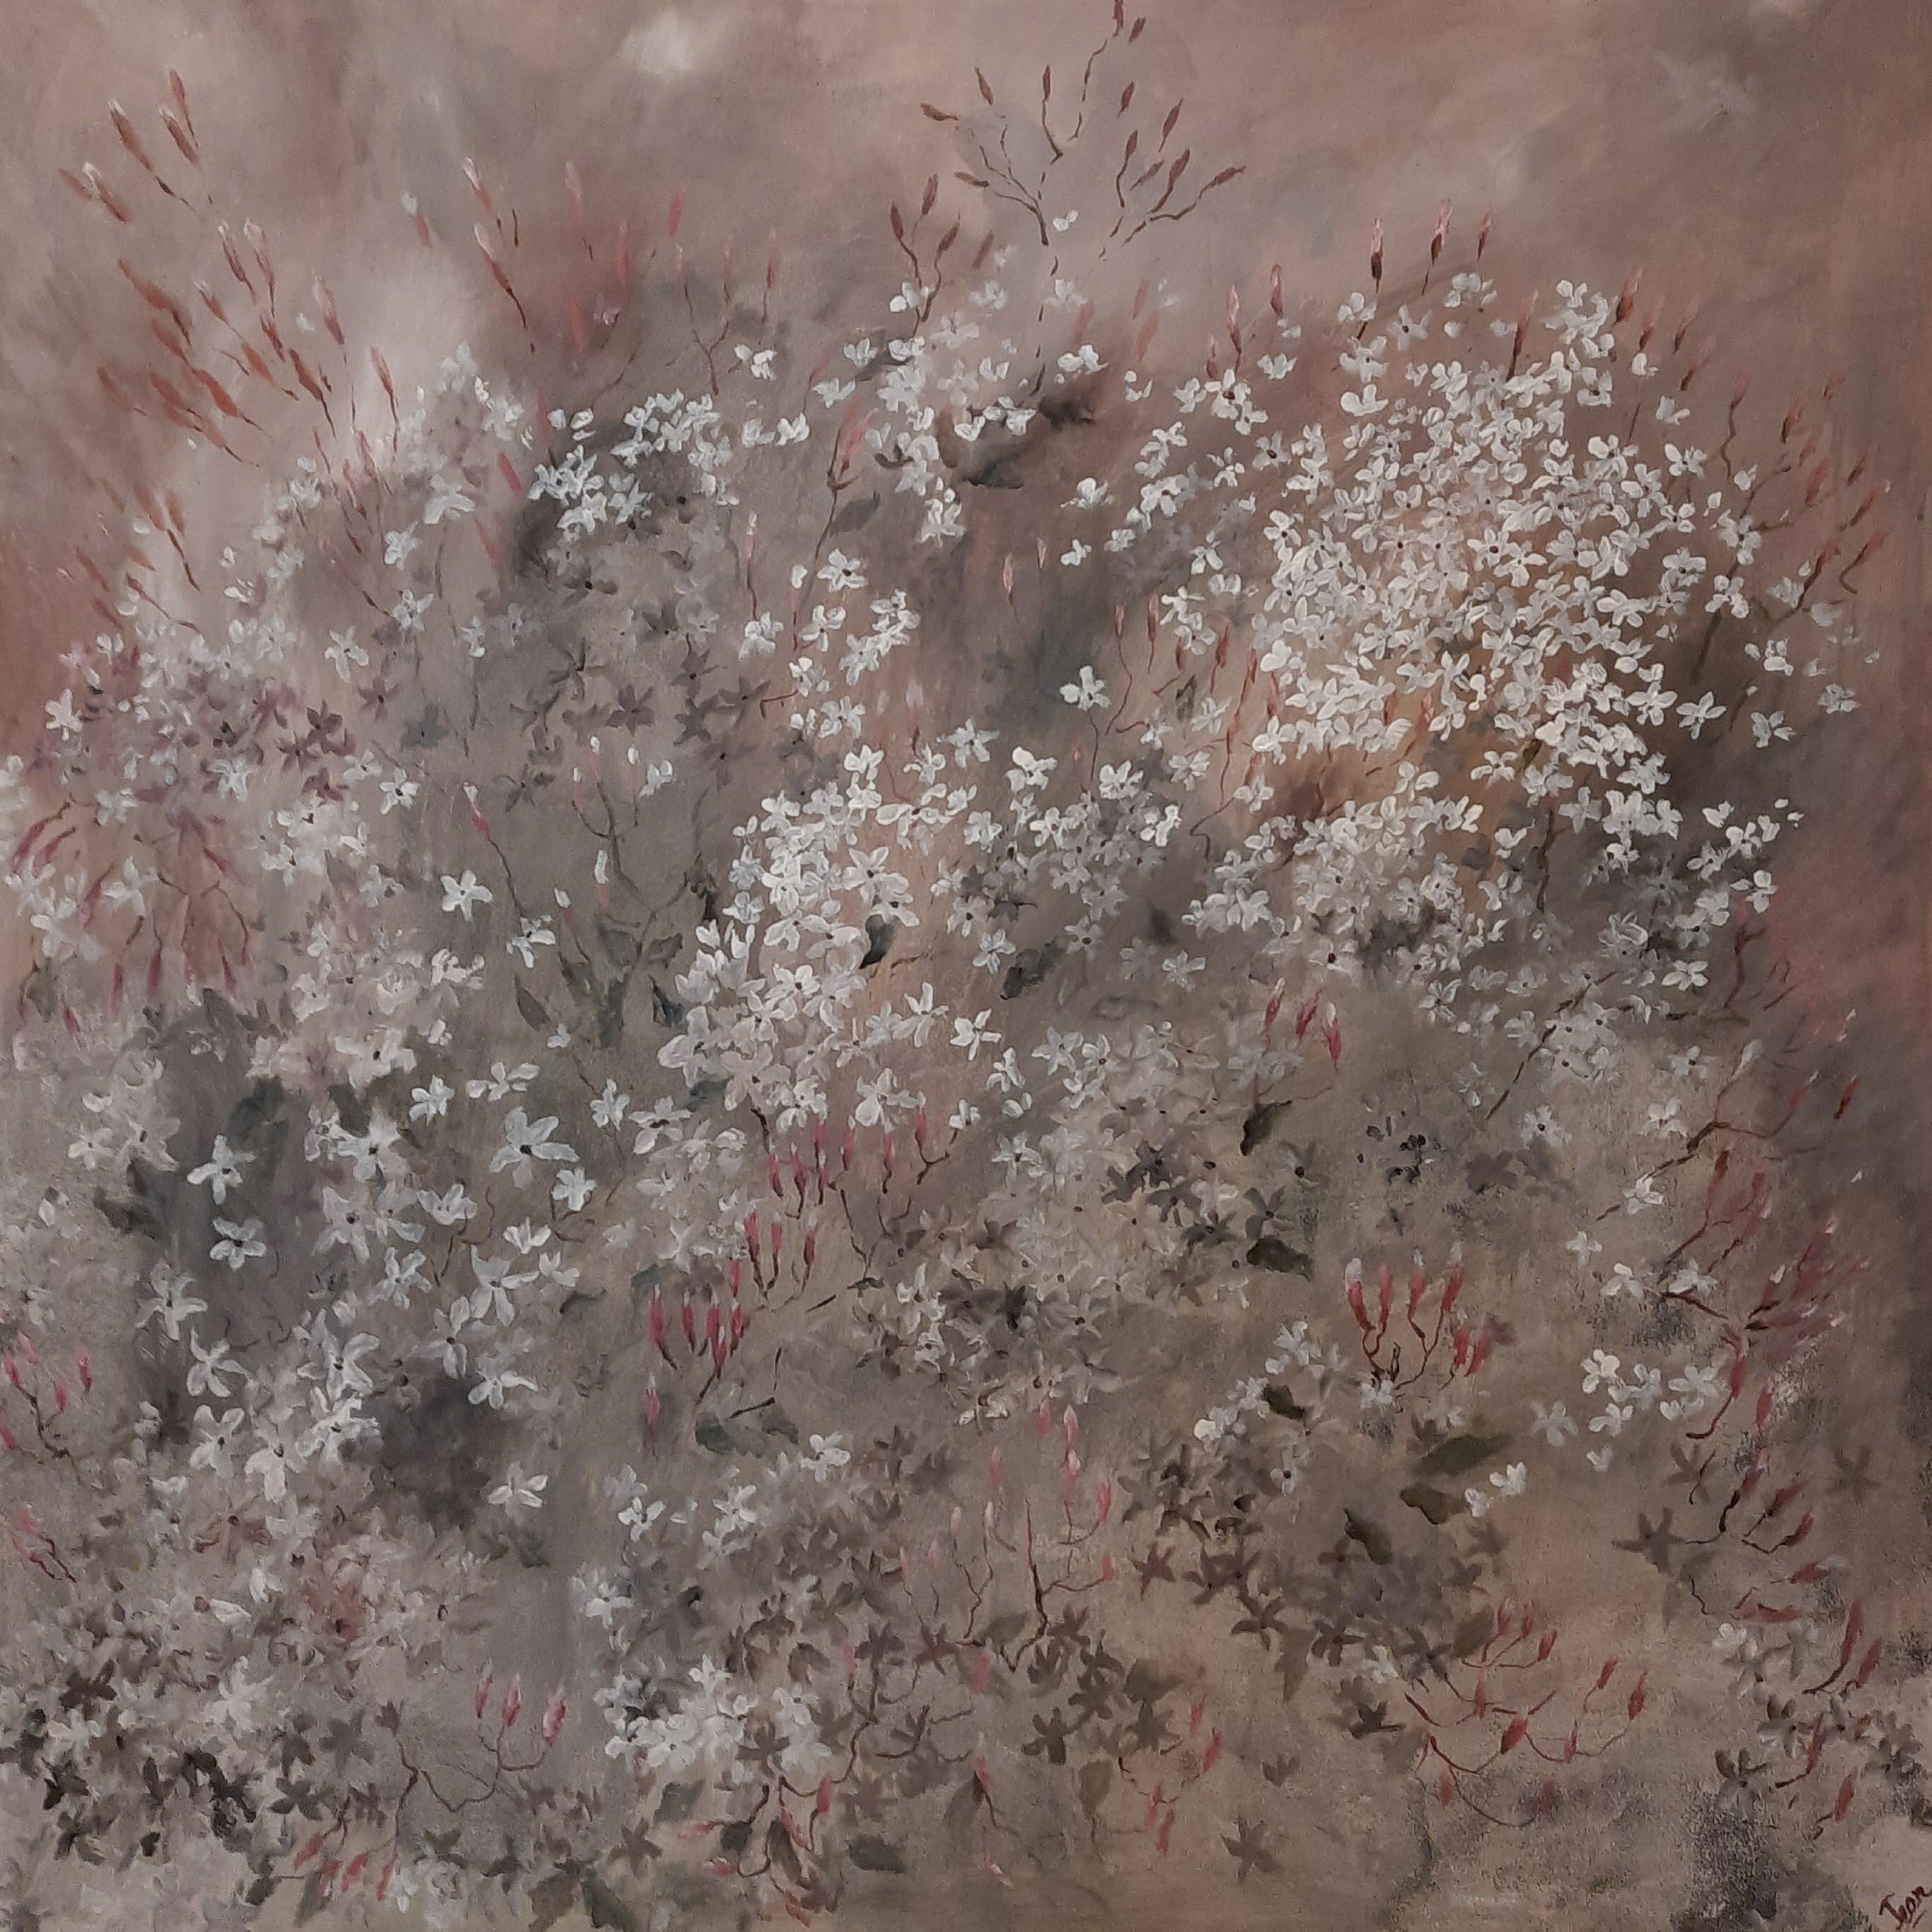 Jasmine splendour by Jean wijesekera